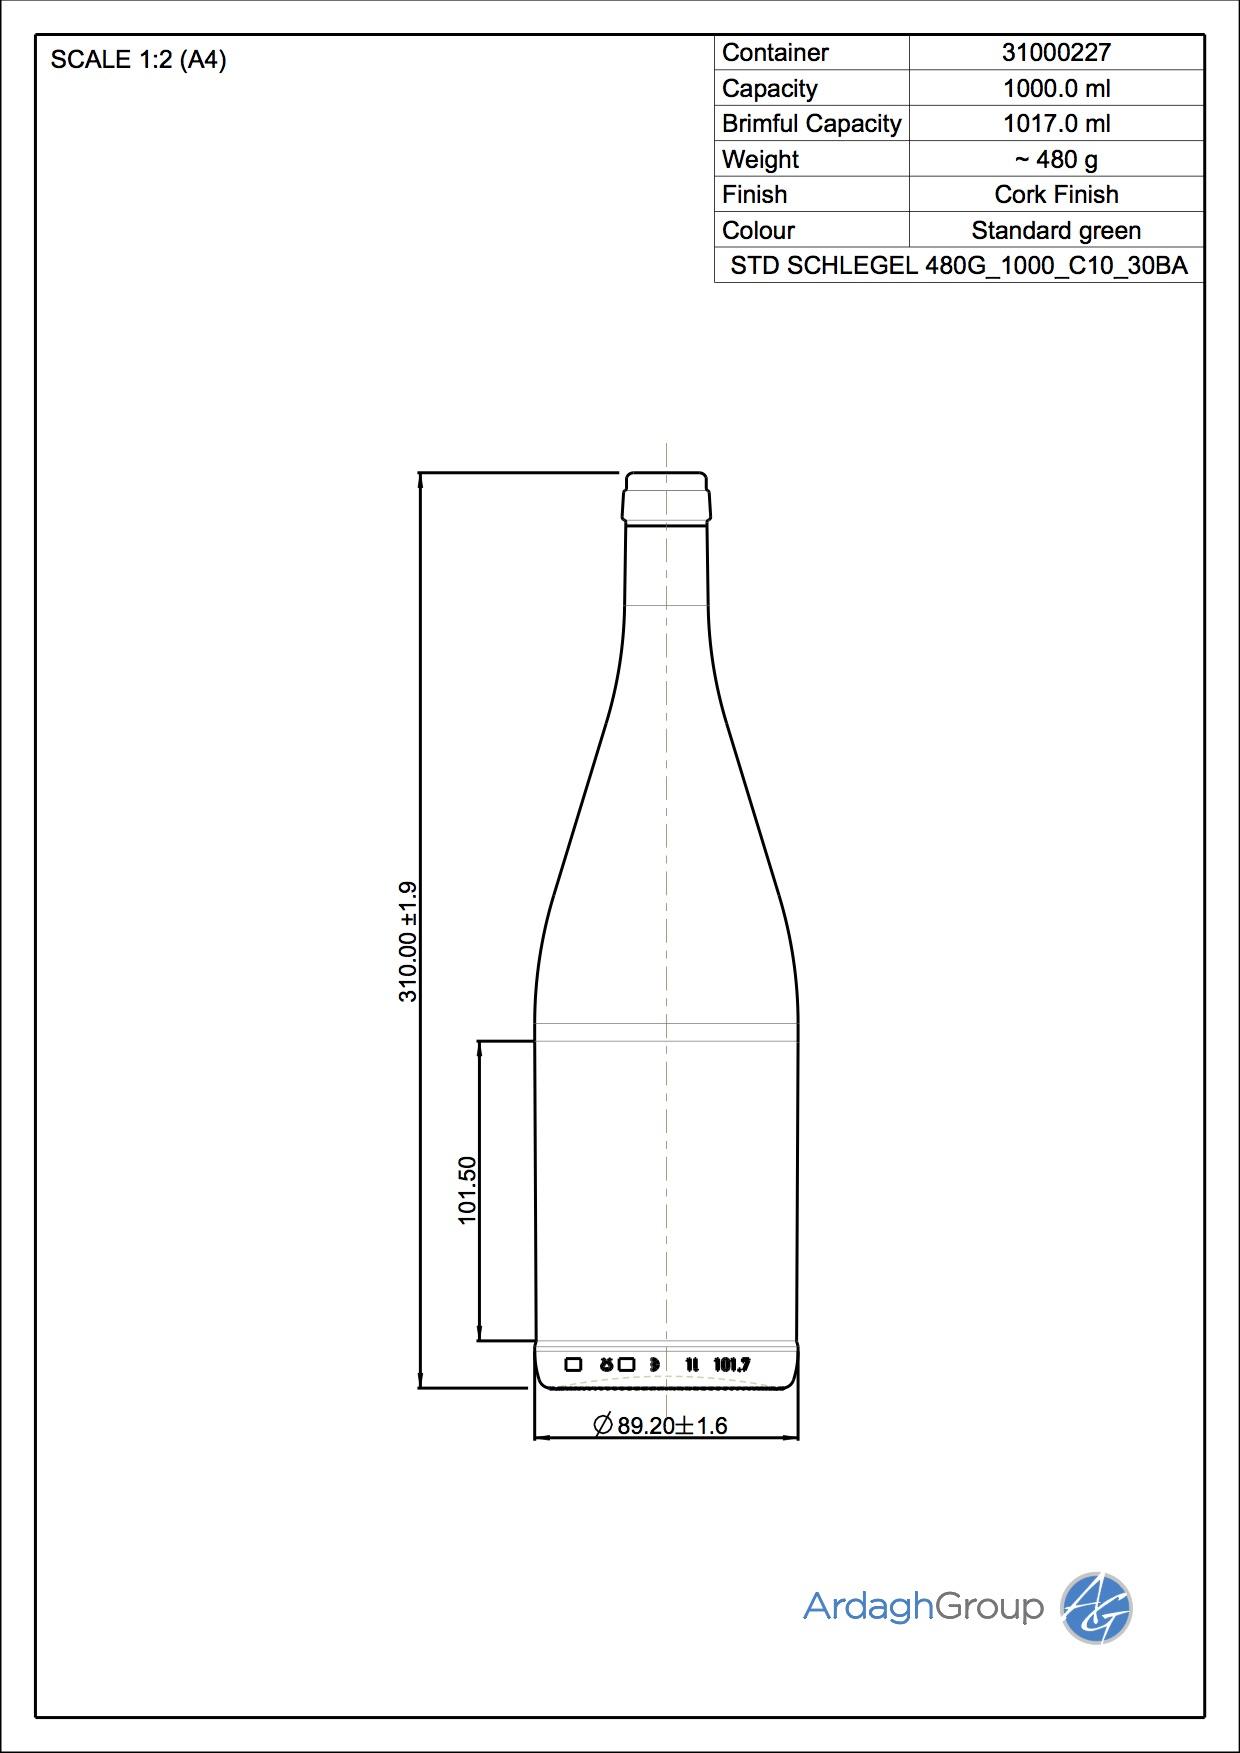 SCHLEGELFLASCHE 1000 C10 30BA